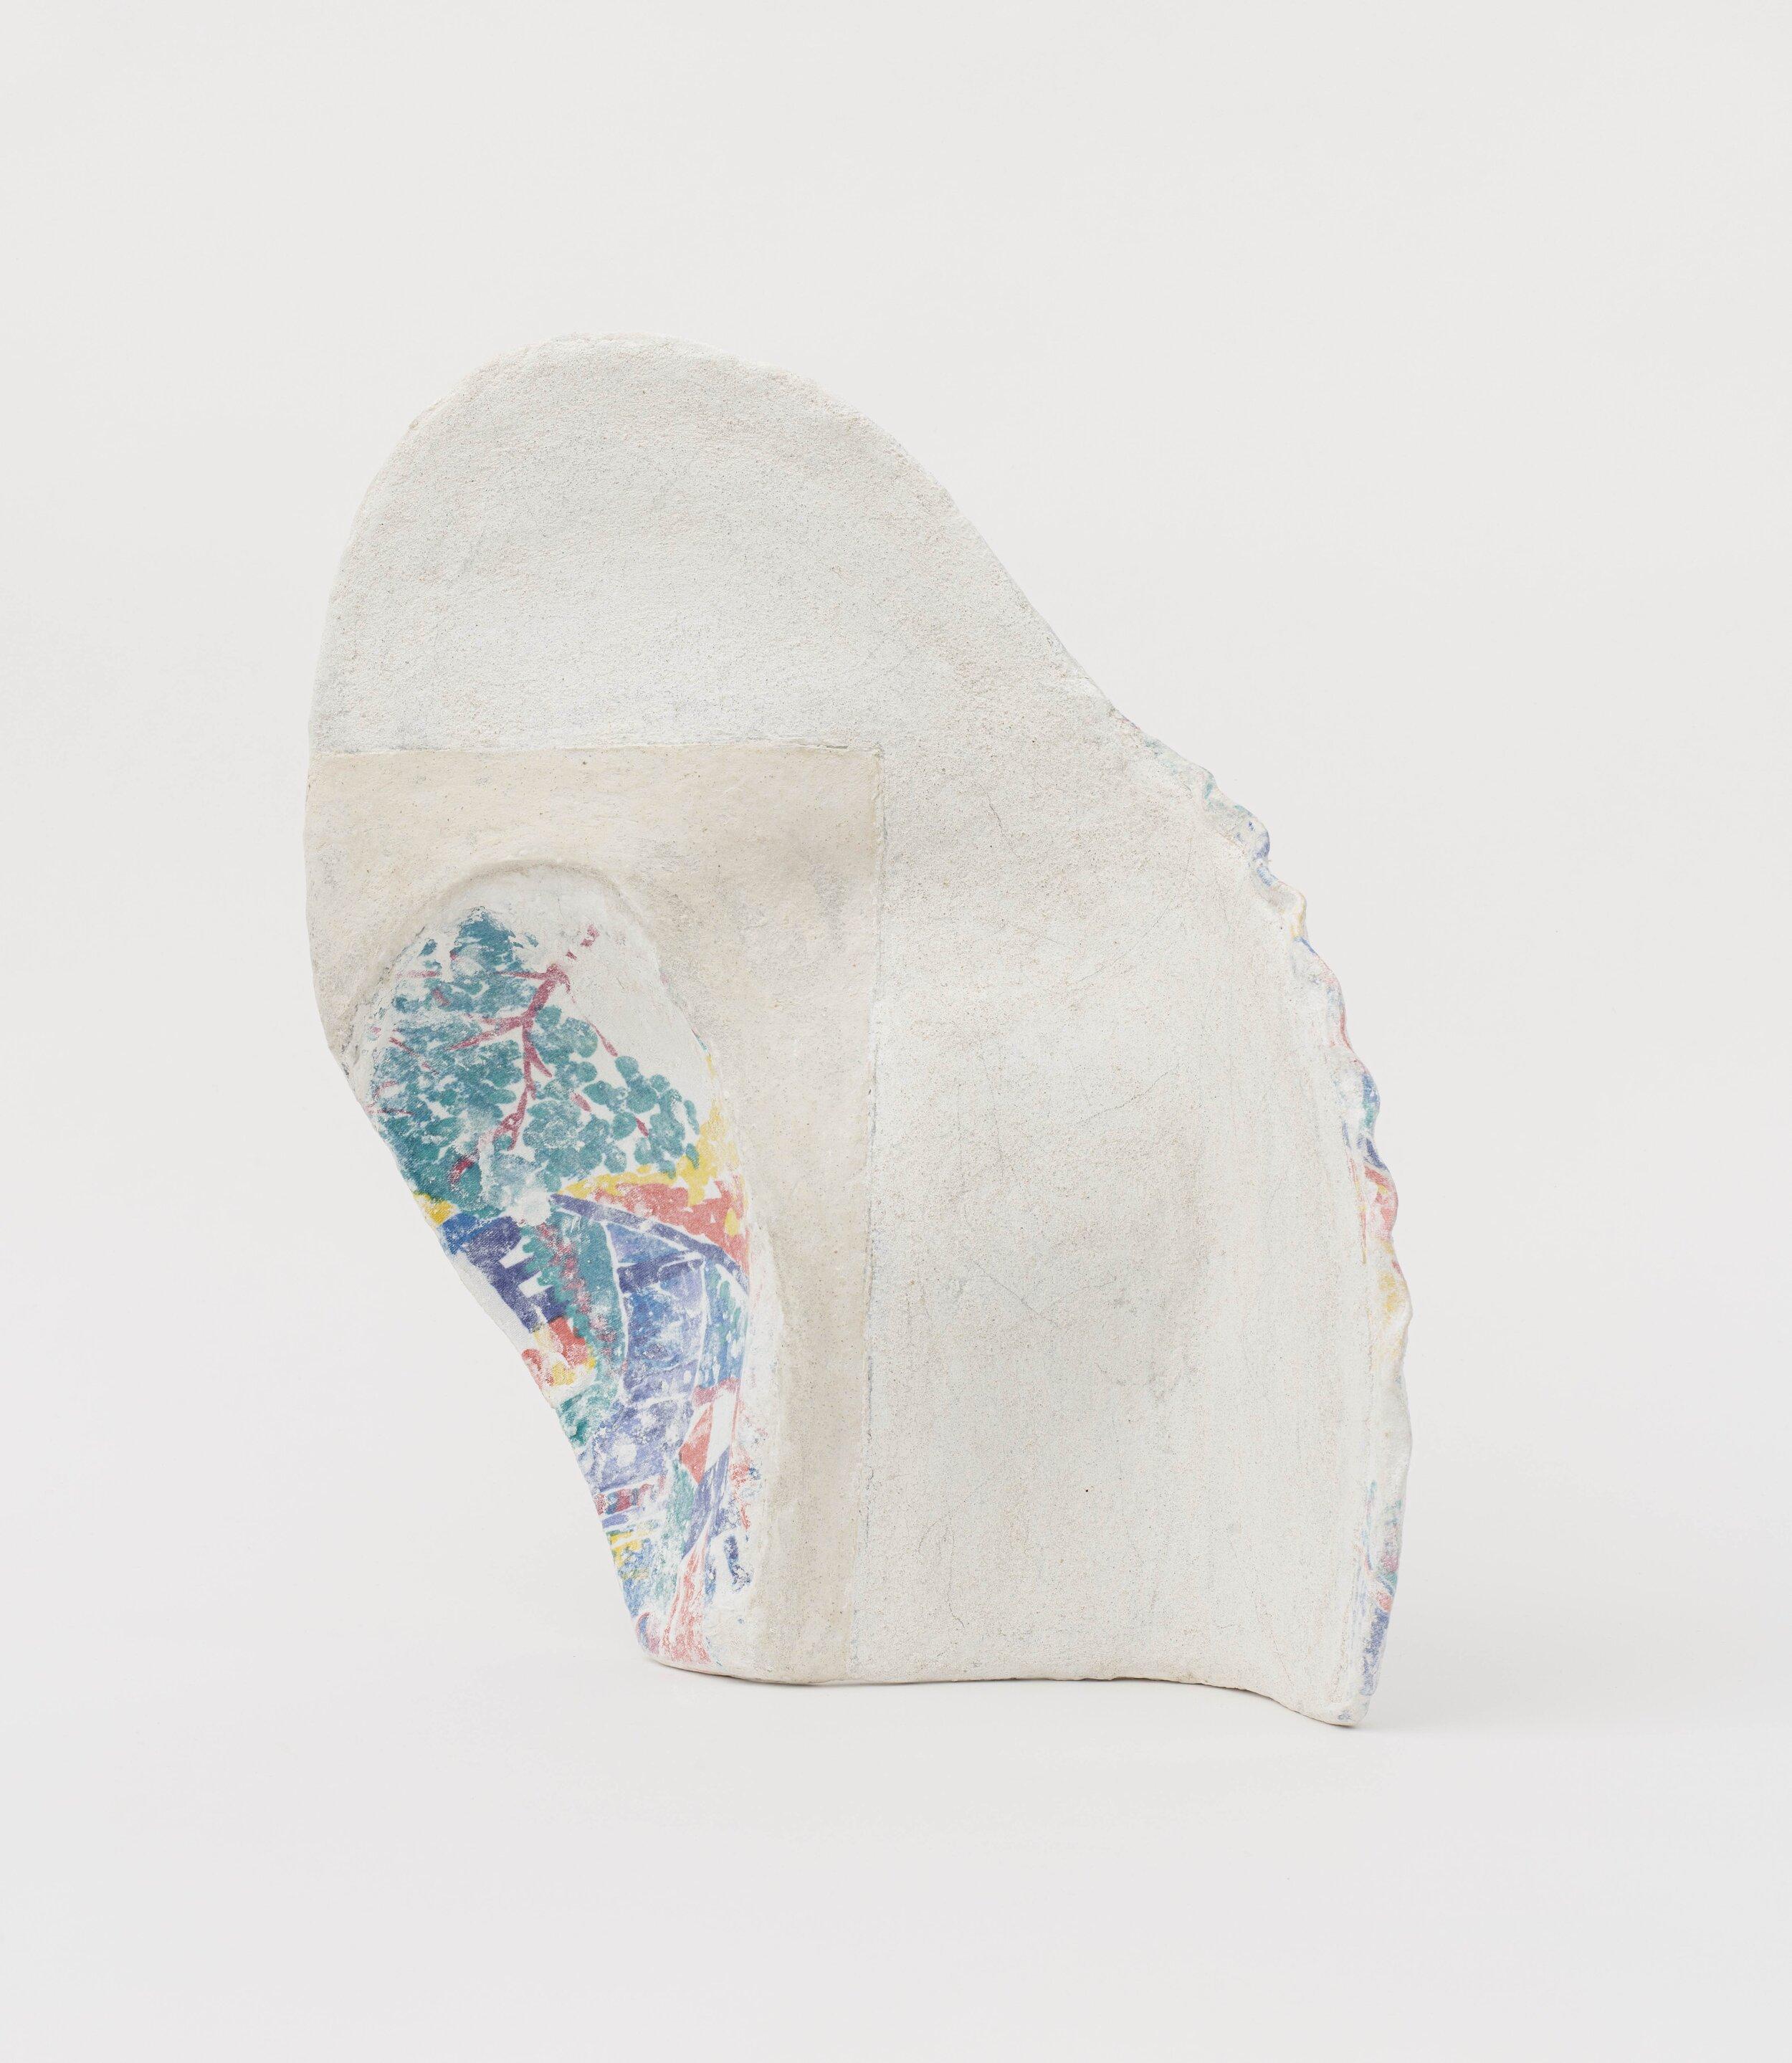 Jennifer Paige Cohen,  Curve with Interior Landscape,  2019. Dress, plaster, lime plaster, CelluClay. 16.5 x 12 x 14 inches. 41.9 x 30.5 x 35.6 cm.